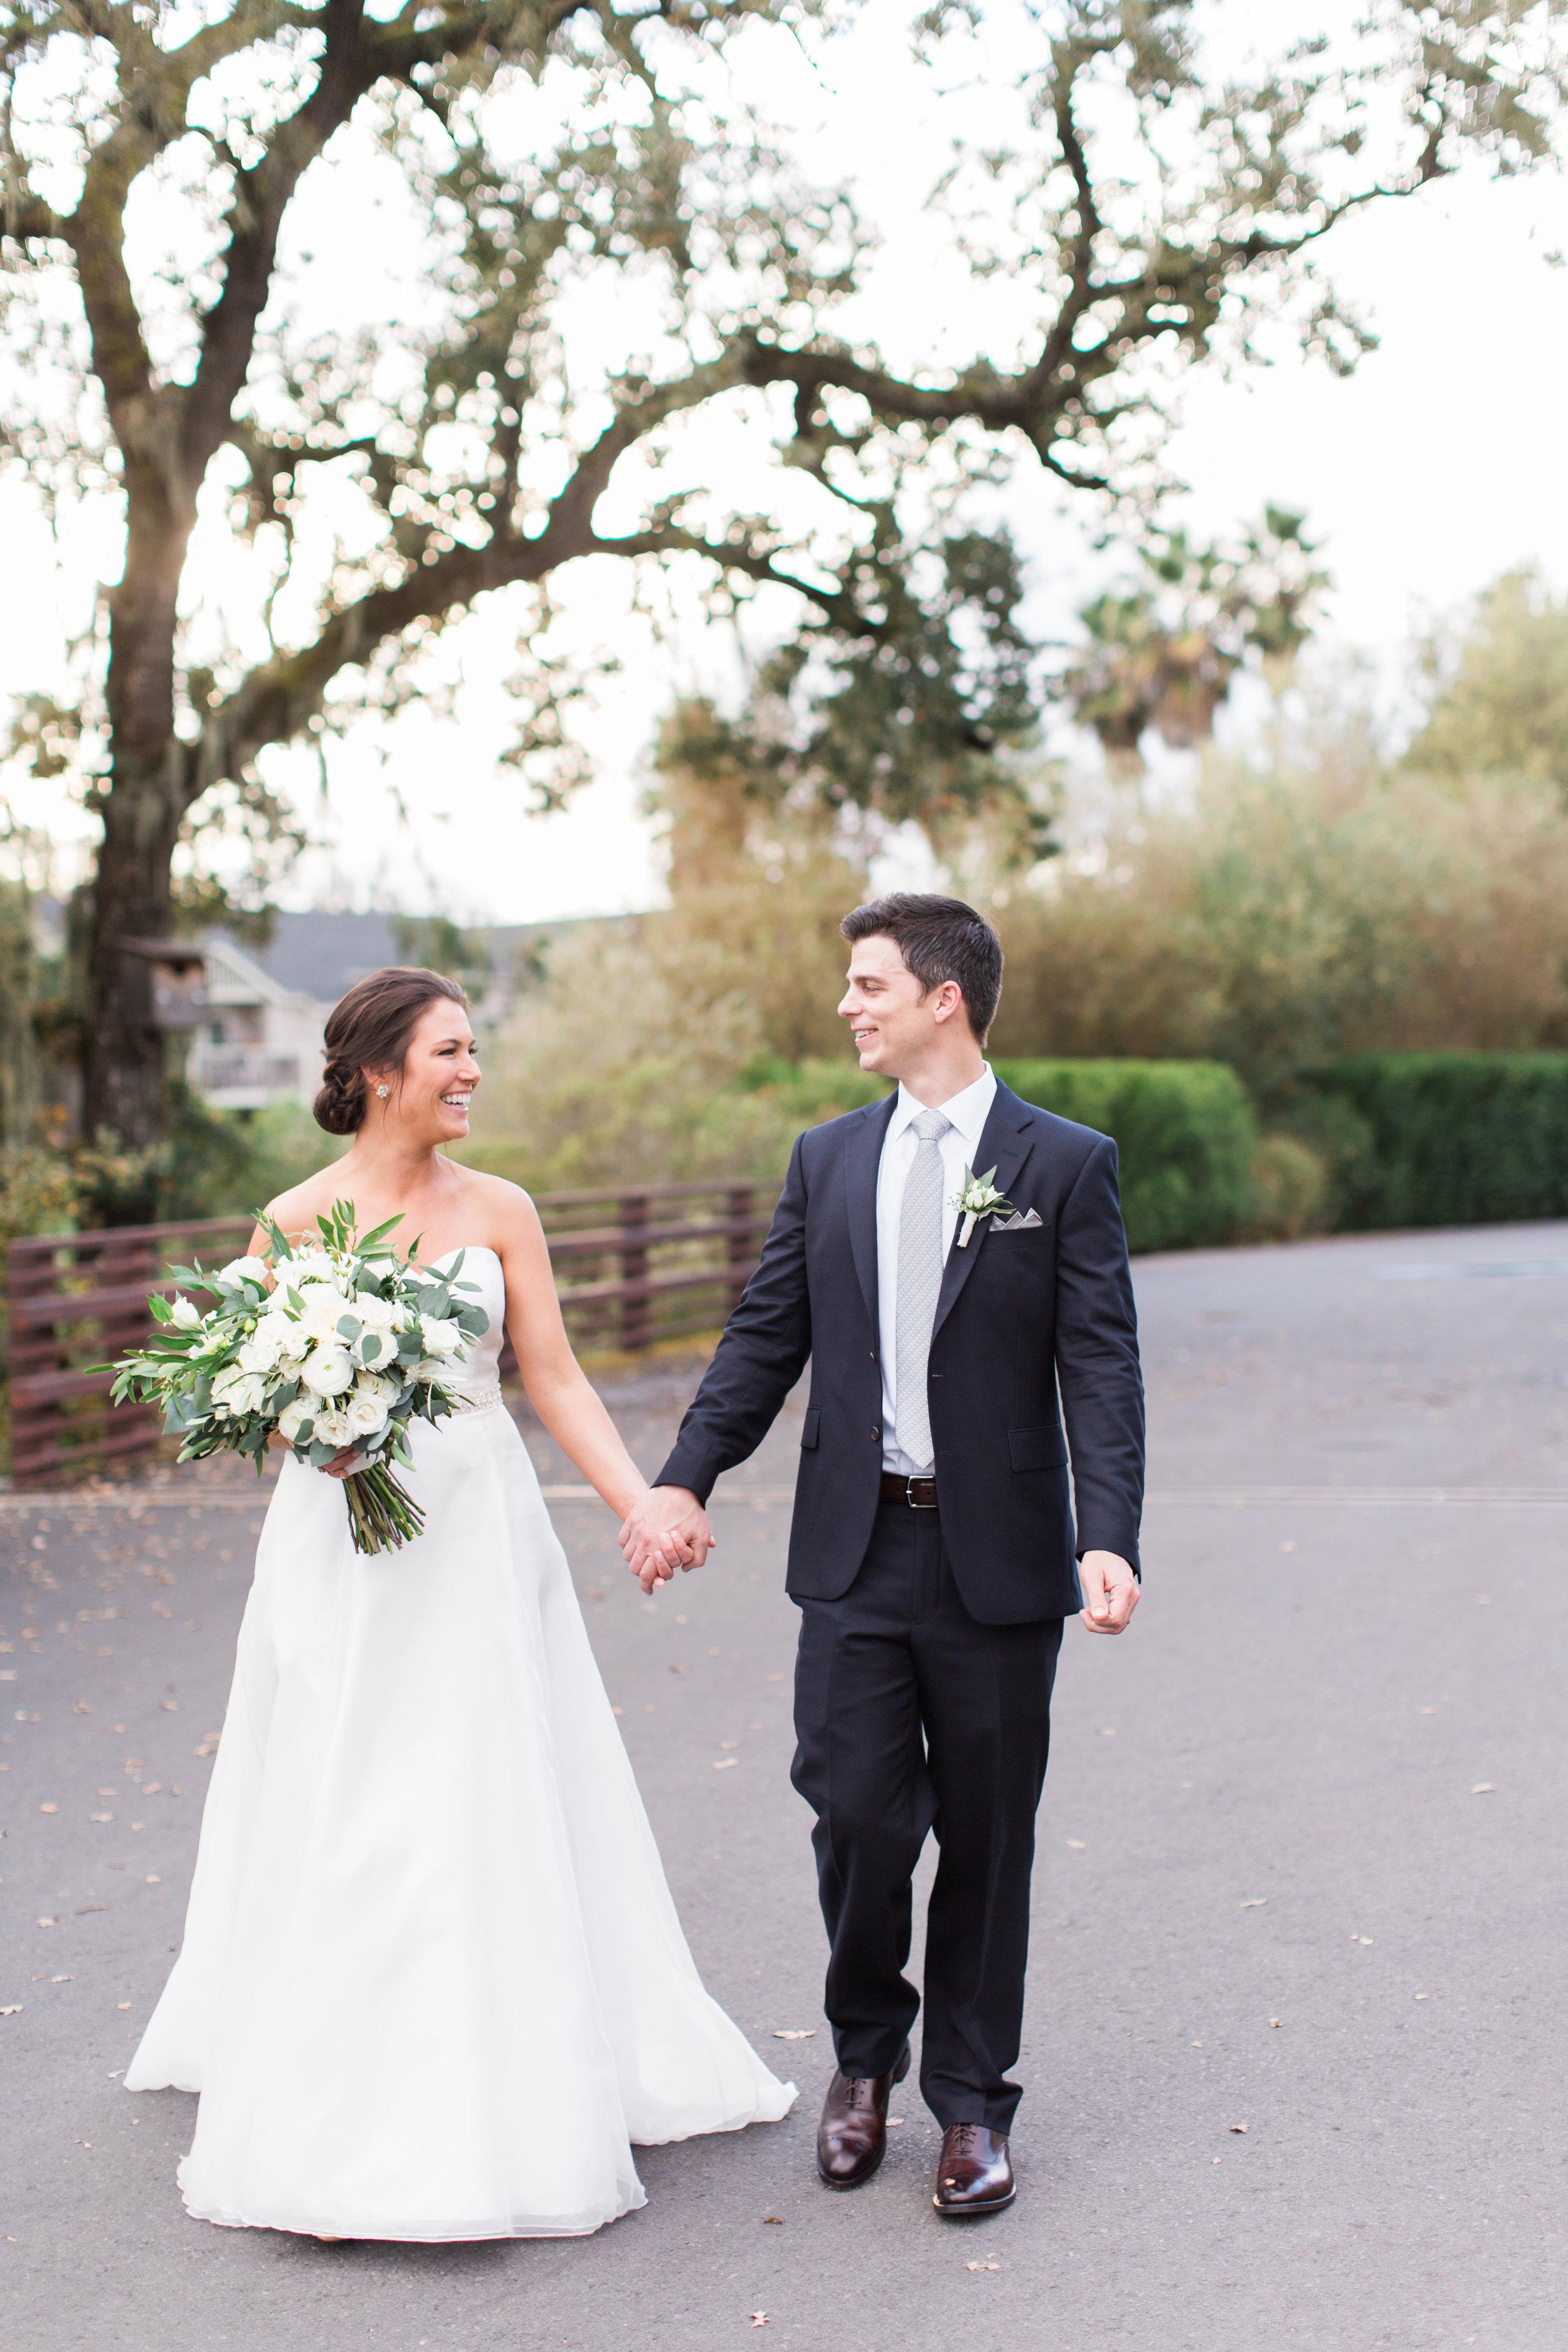 intimate-wedding-at-solage-calistoga-in-napa-87.jpg